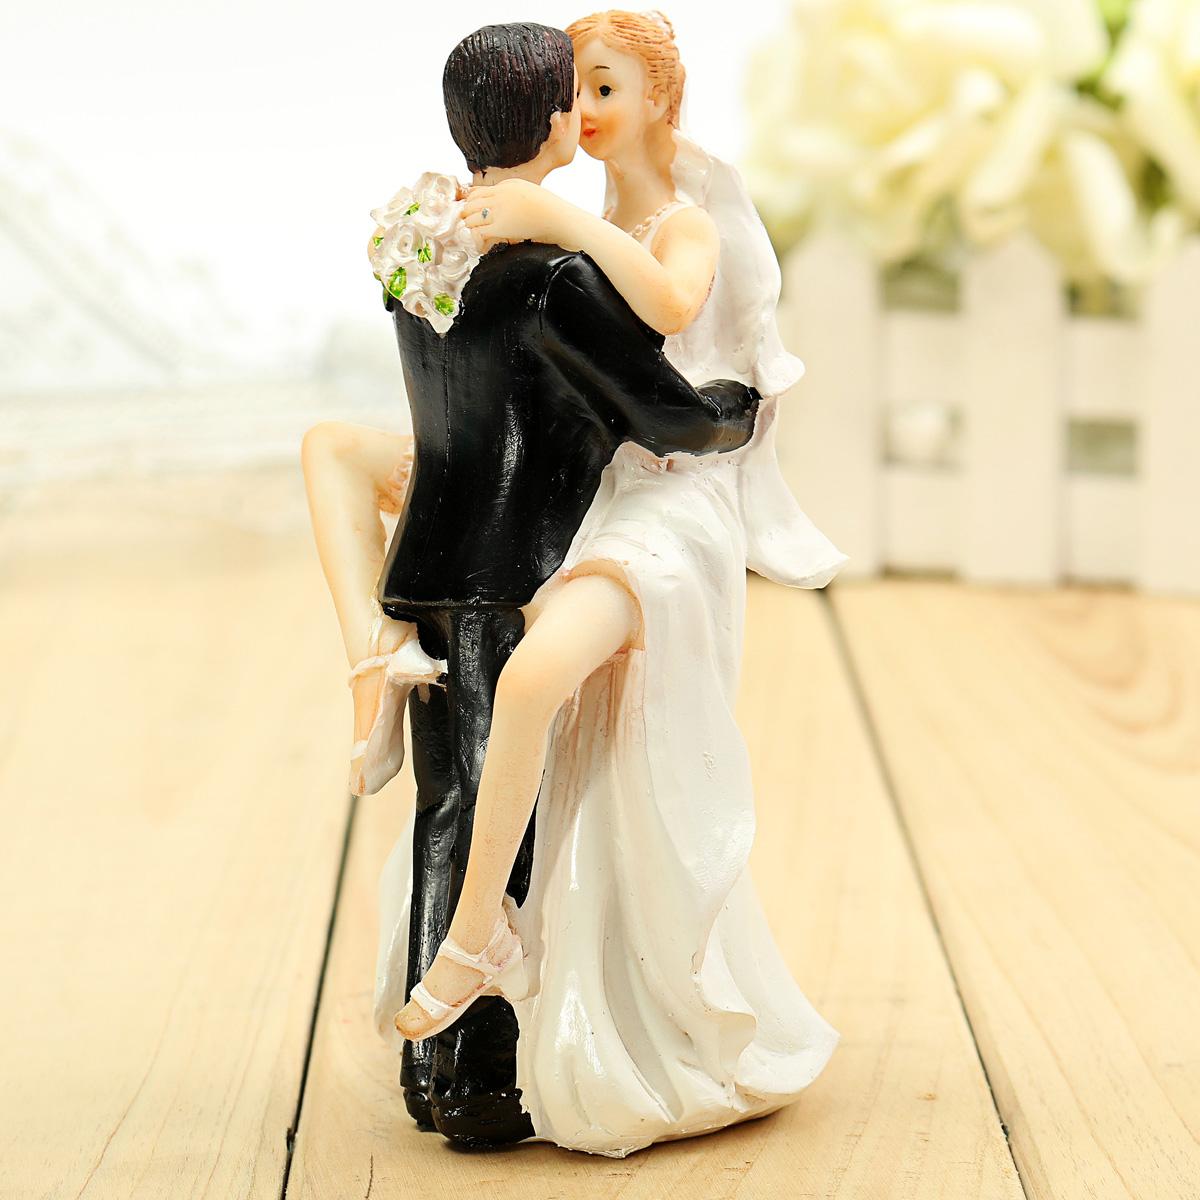 Bride Groom Resin Wedding Cake Topper Couple Figurine Romantic ...